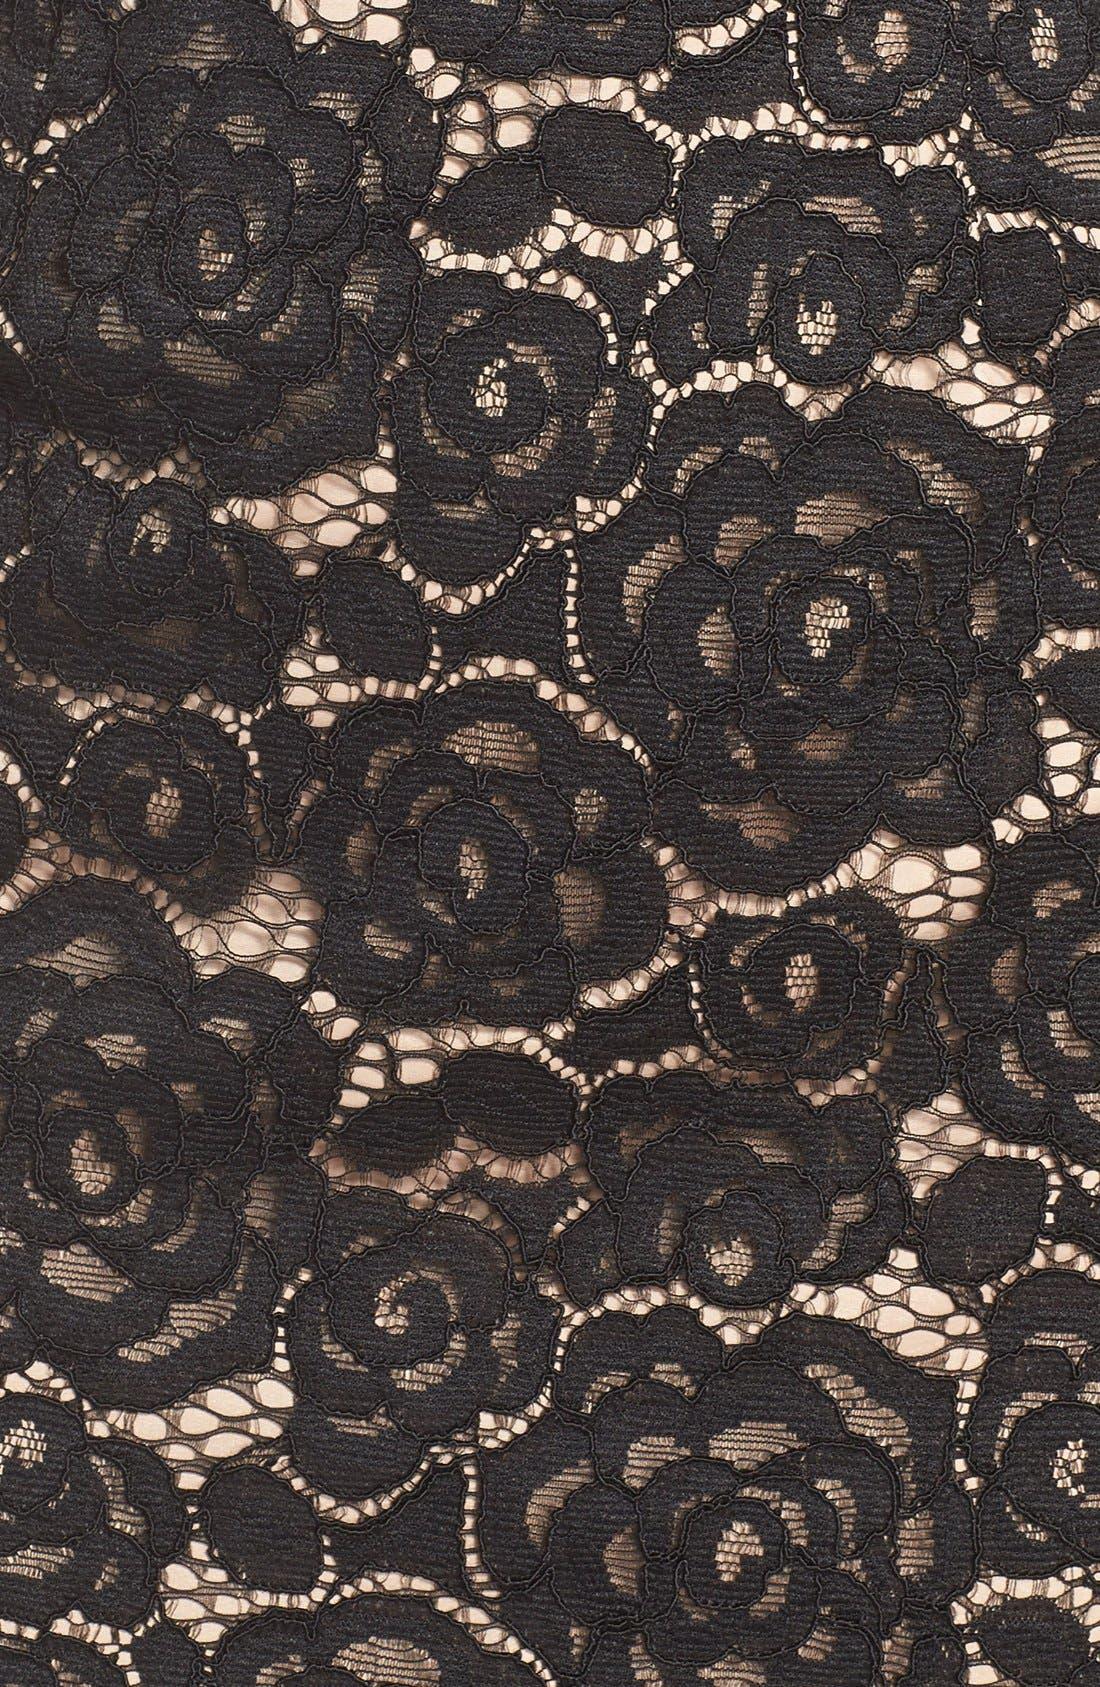 Off the Shoulder Lace Sheath Dress,                             Alternate thumbnail 7, color,